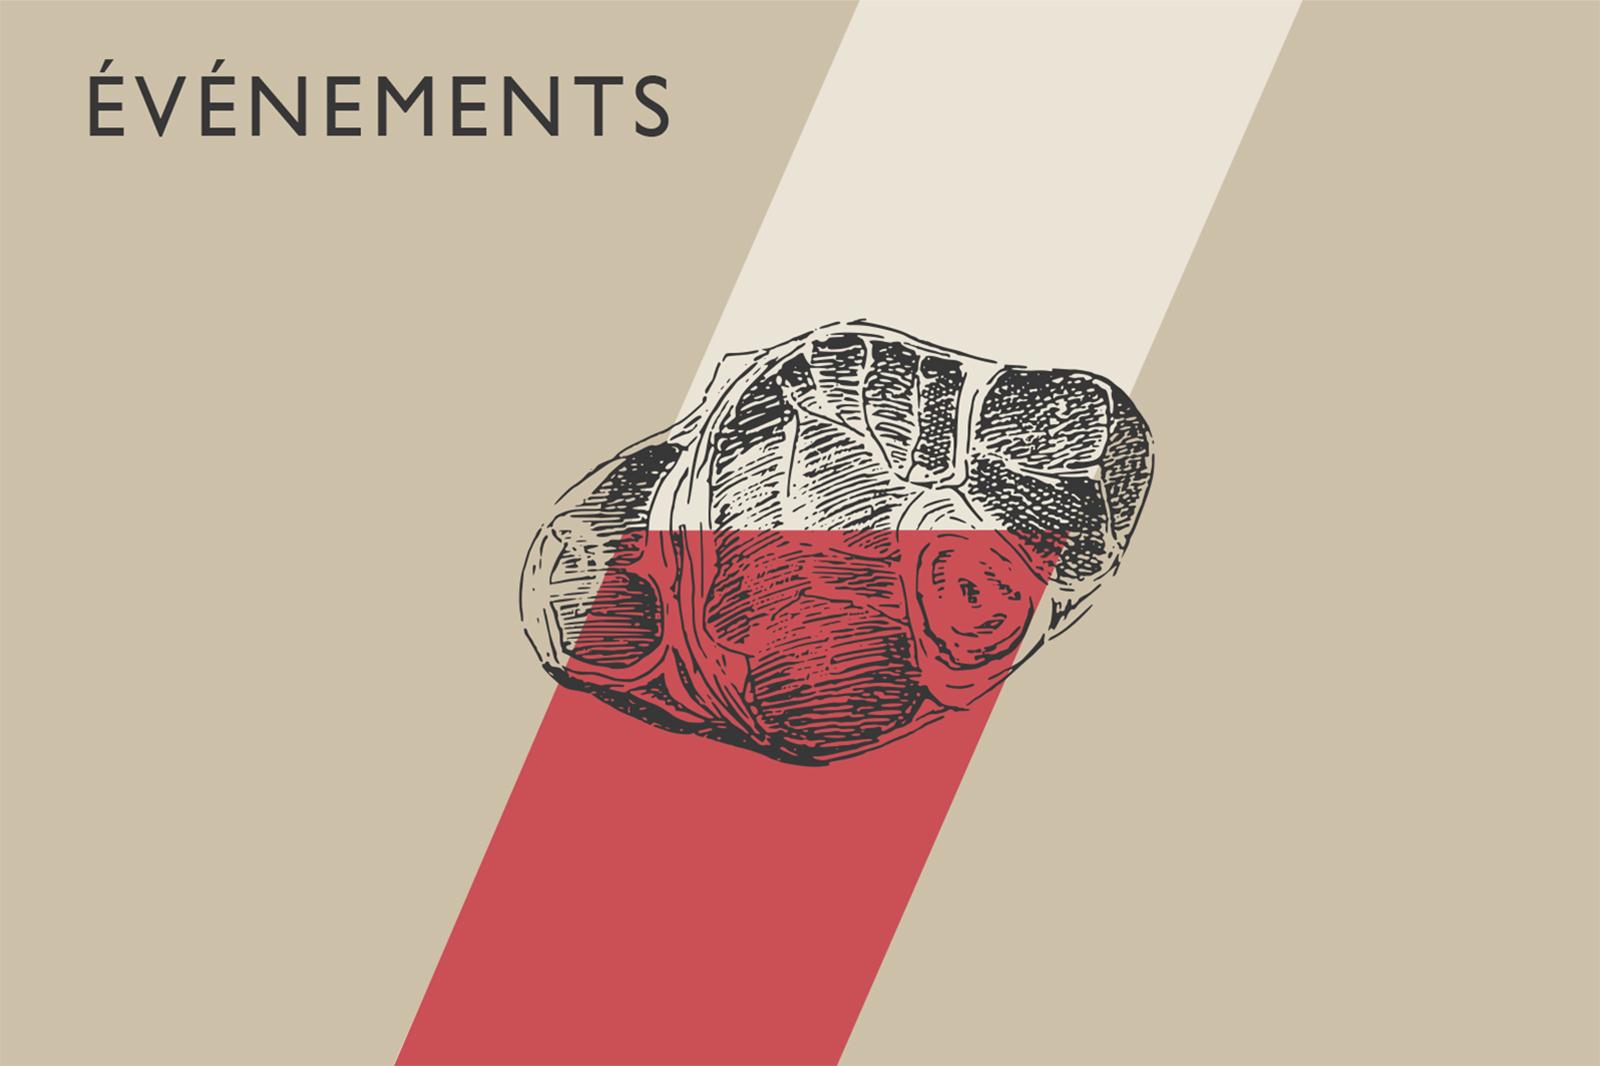 pampa_evenements3